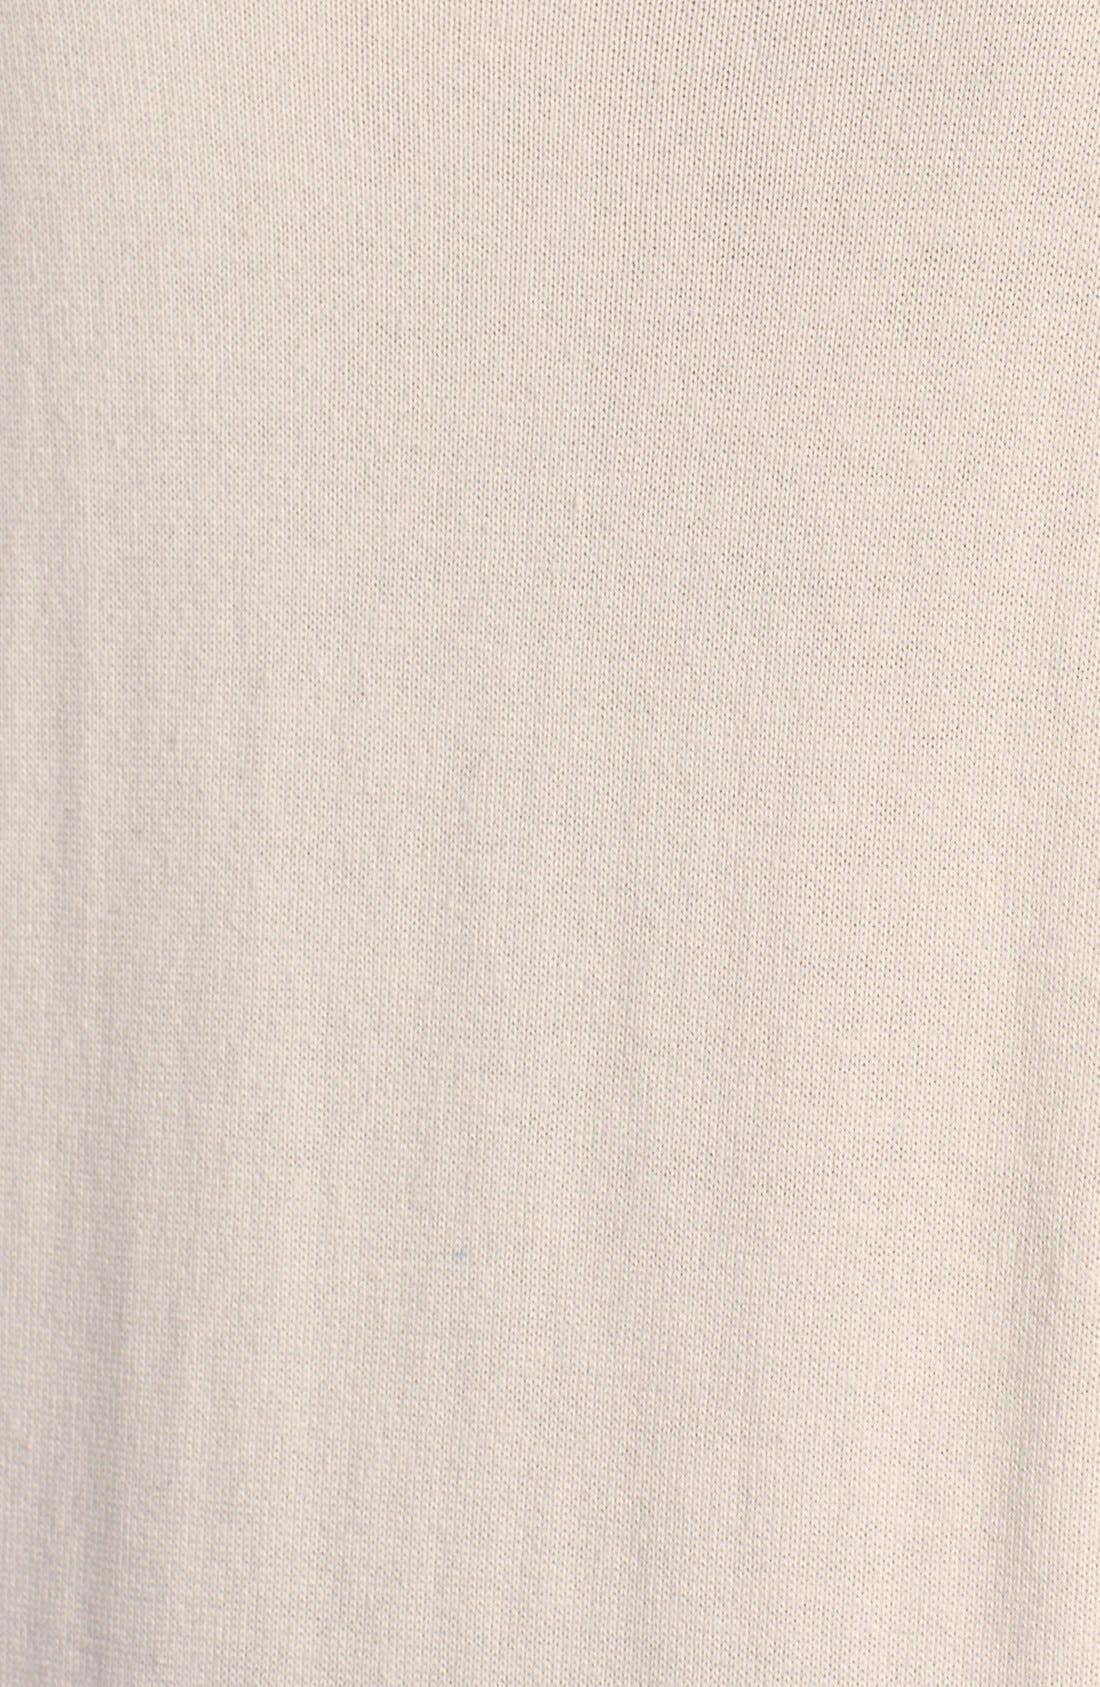 Intarsia Crewneck Sweater,                             Alternate thumbnail 10, color,